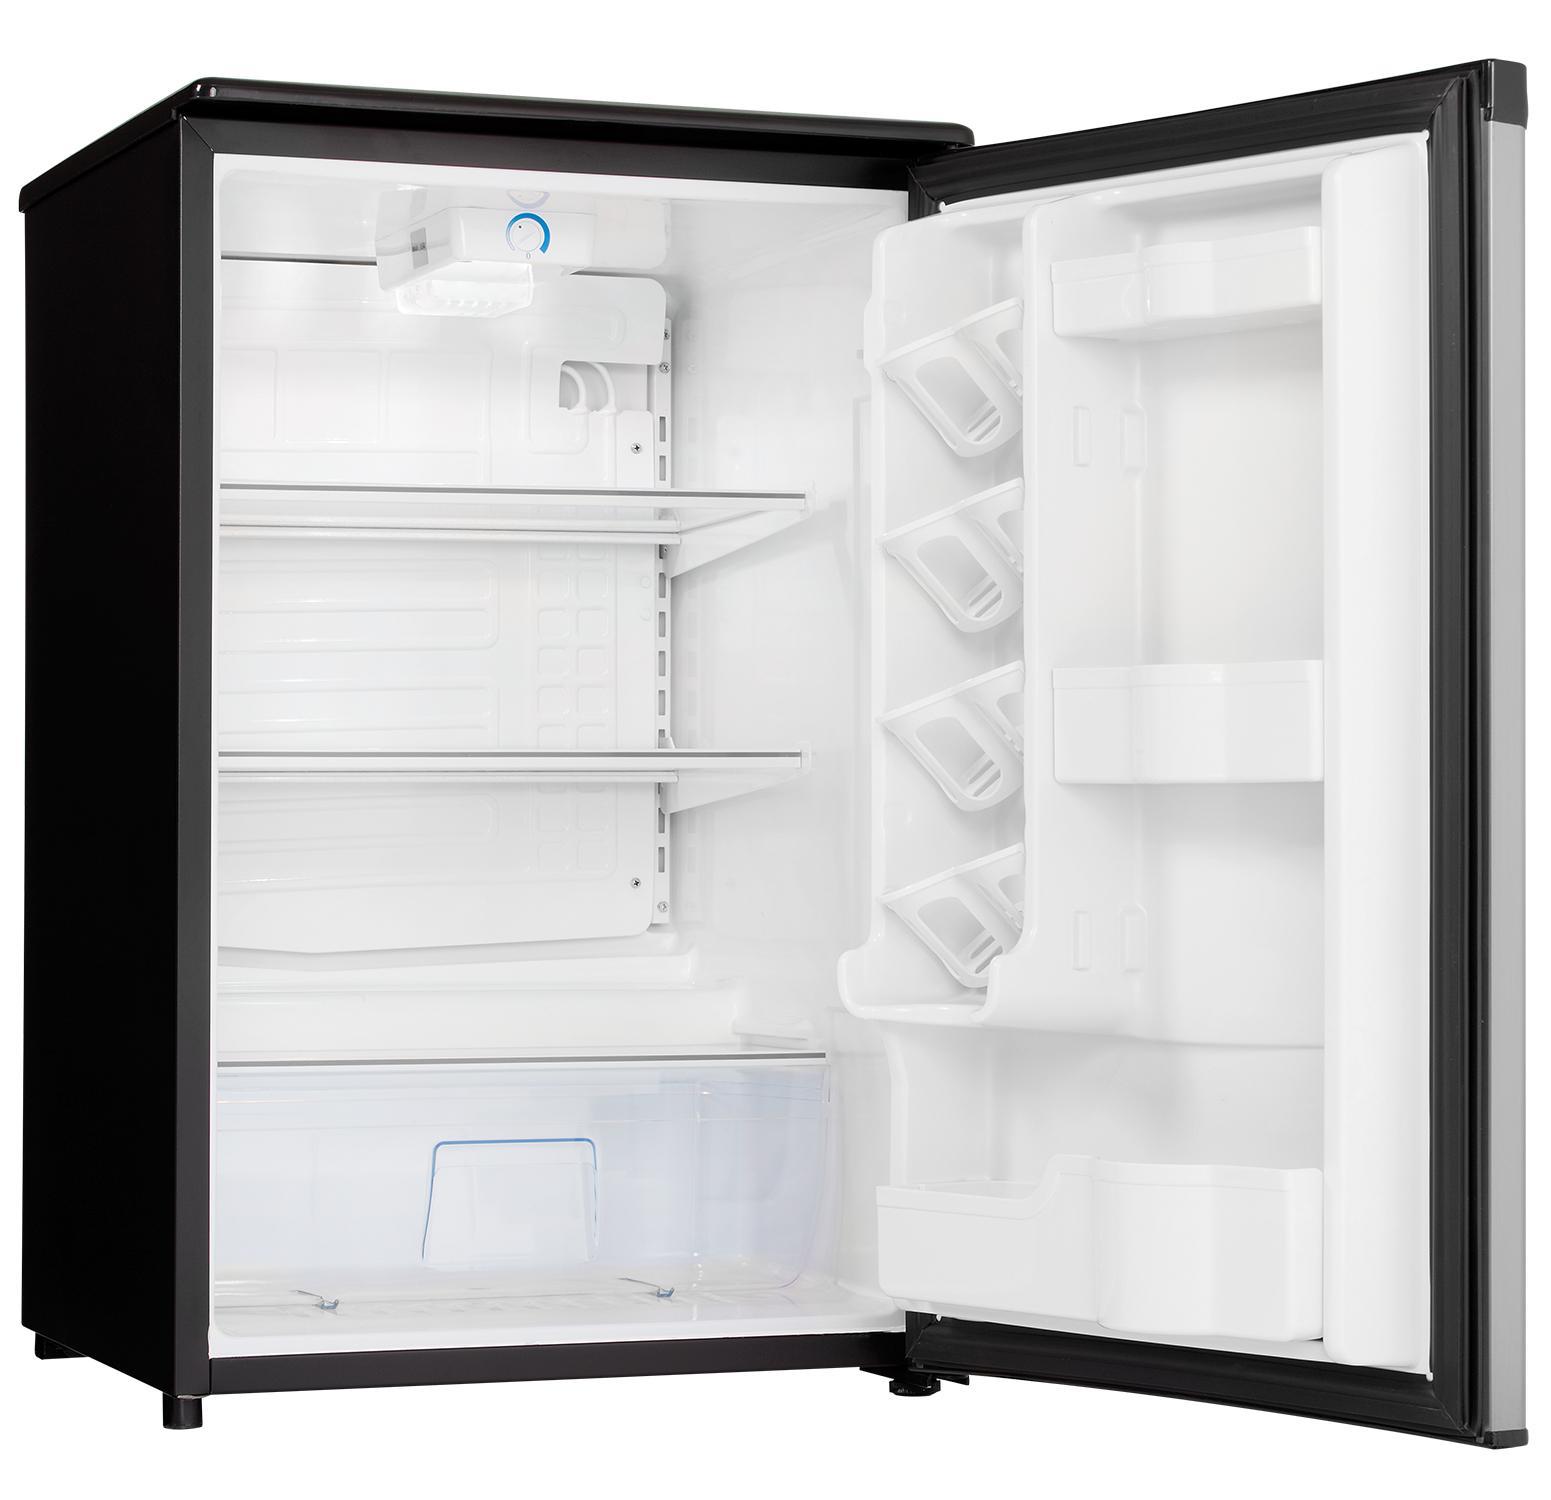 danby dar044a5bsldd compact all refrigerator spotless steel door 4 4 cubic feet. Black Bedroom Furniture Sets. Home Design Ideas